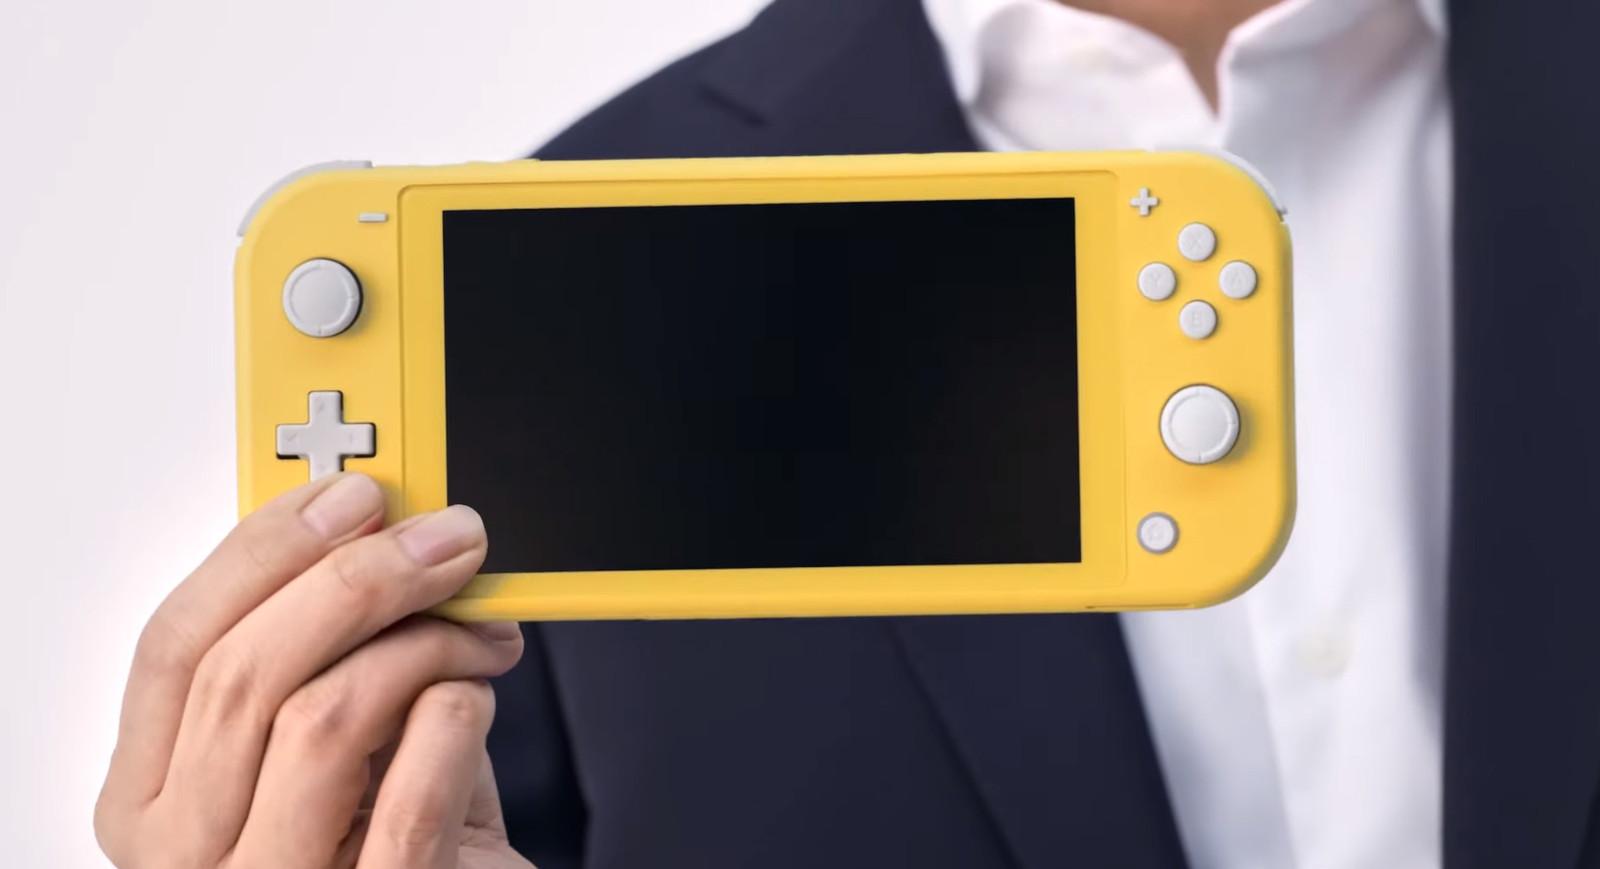 Nintendo lance la Switch Lite, sa nouvelle console portable.